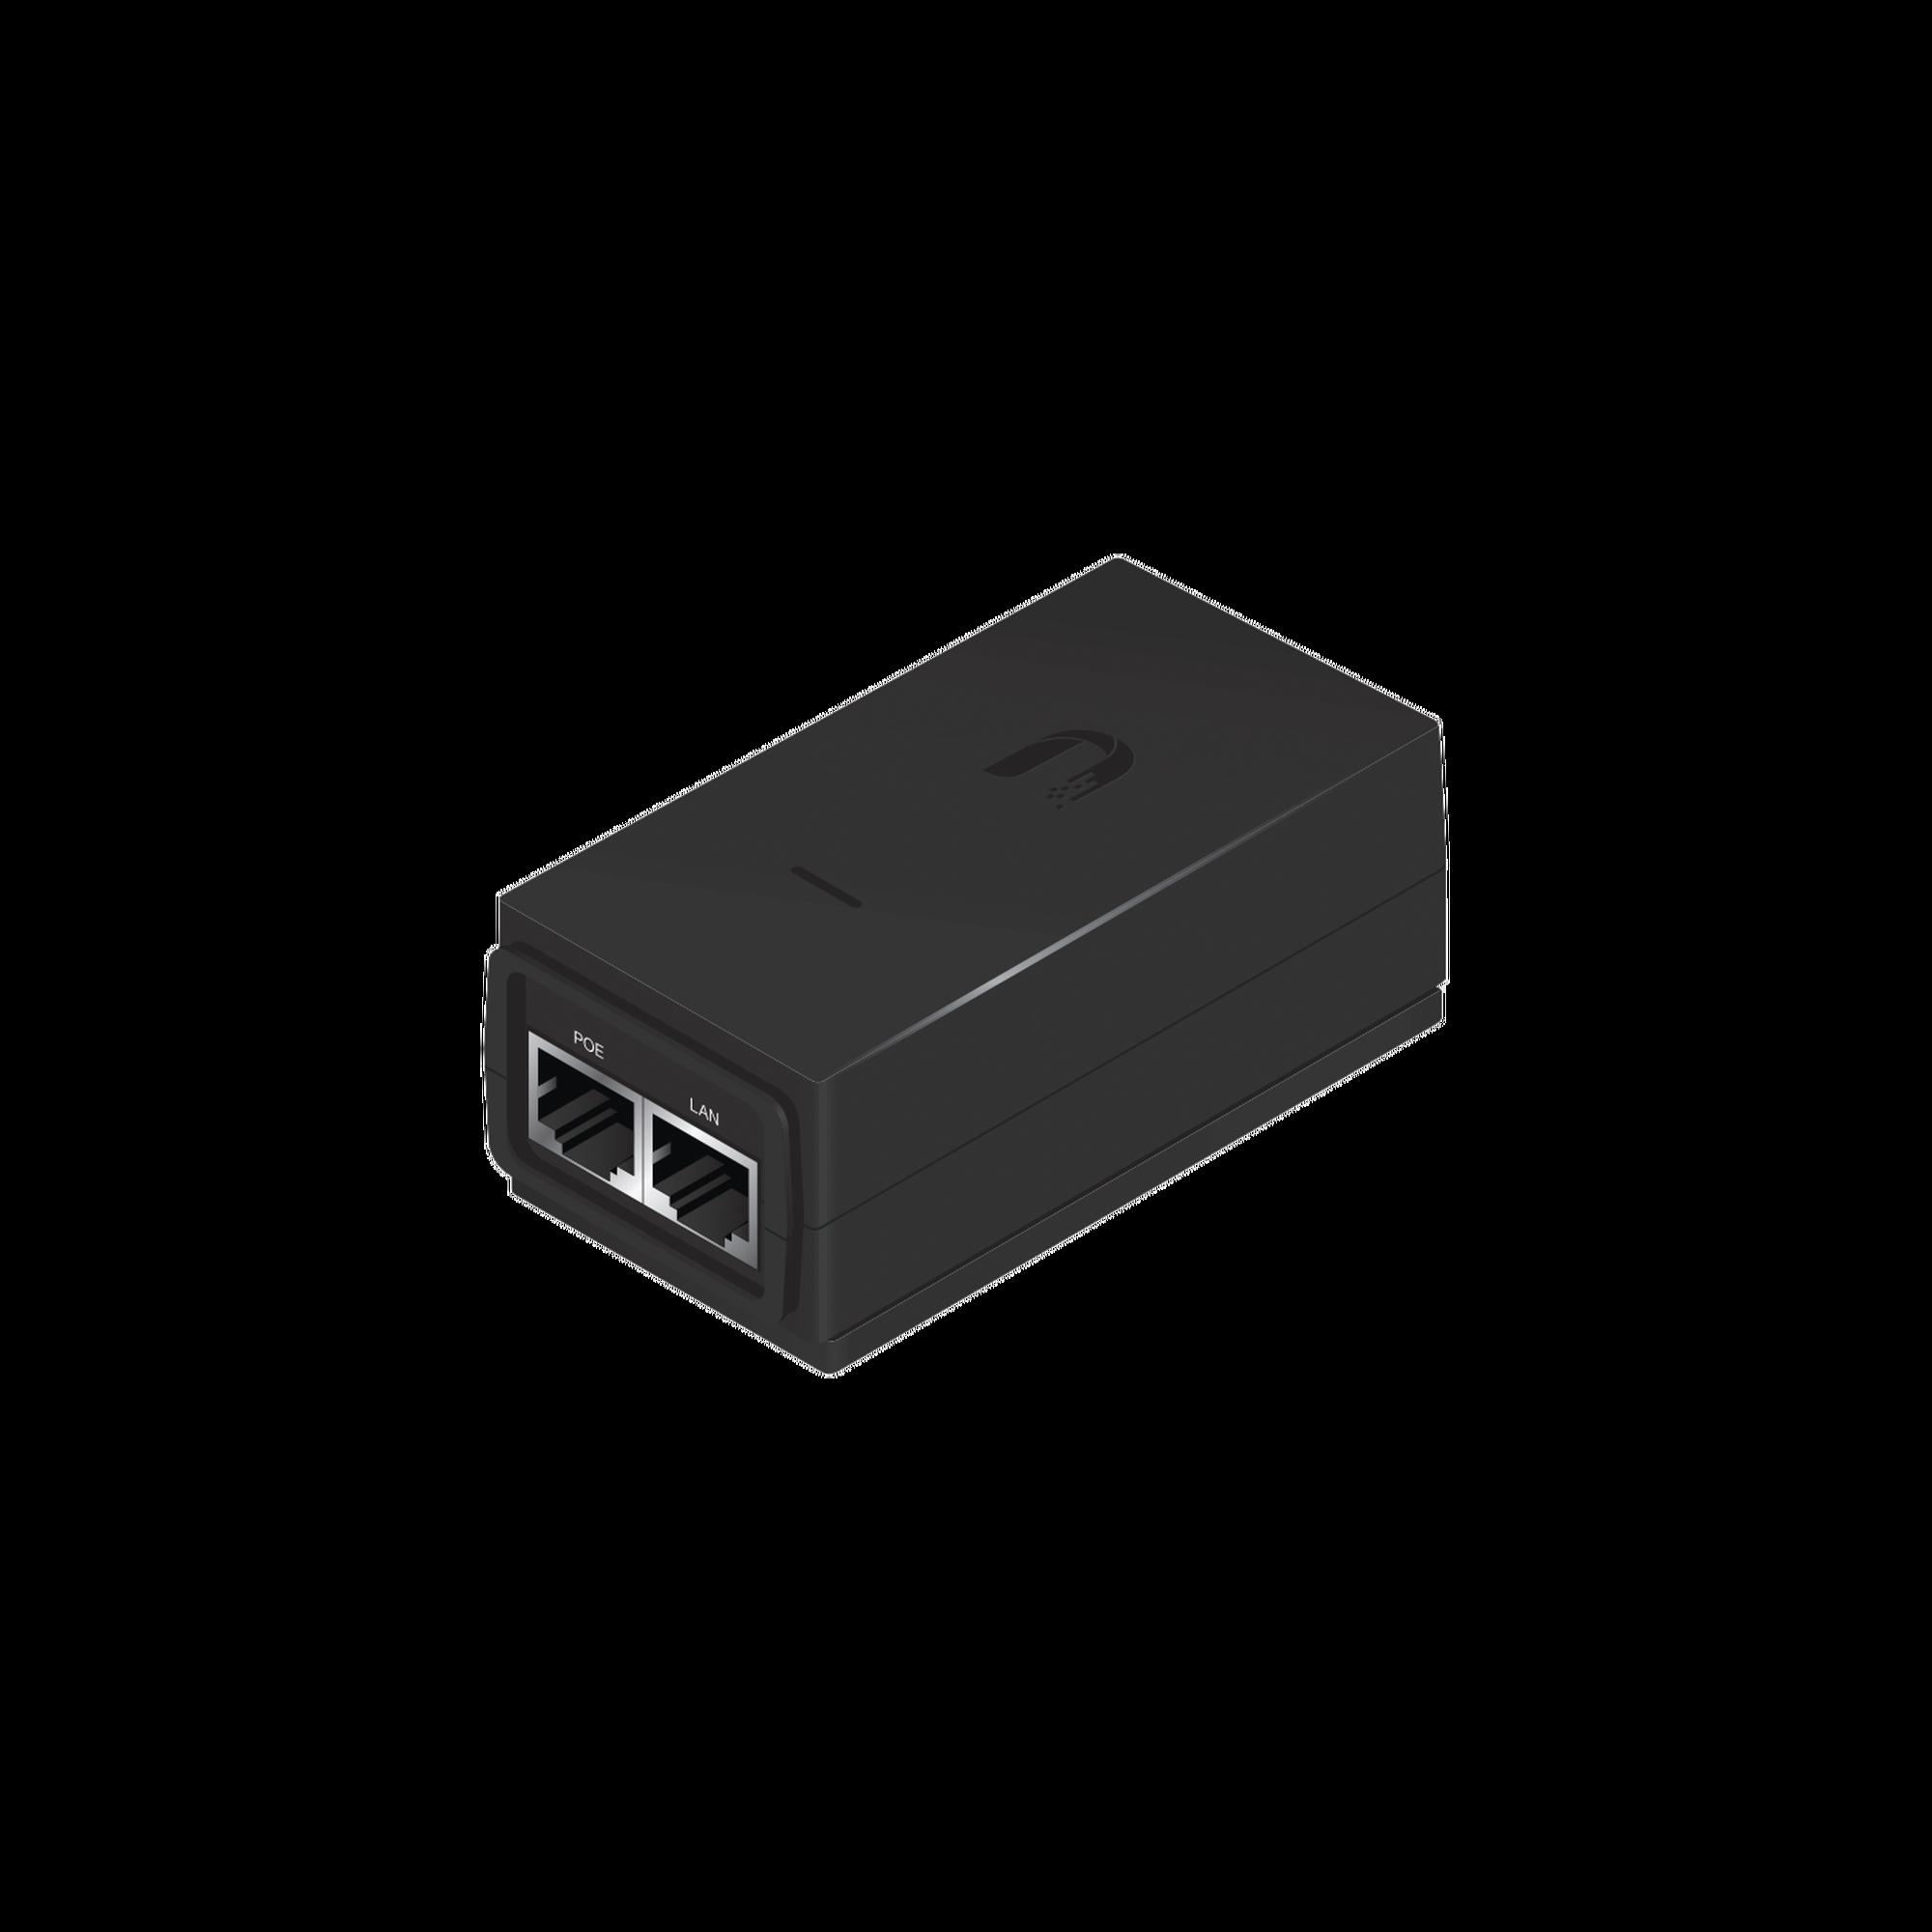 Adaptador PoE Ubiquiti de 24 VDC, 0.5 A, compatible con airGateway